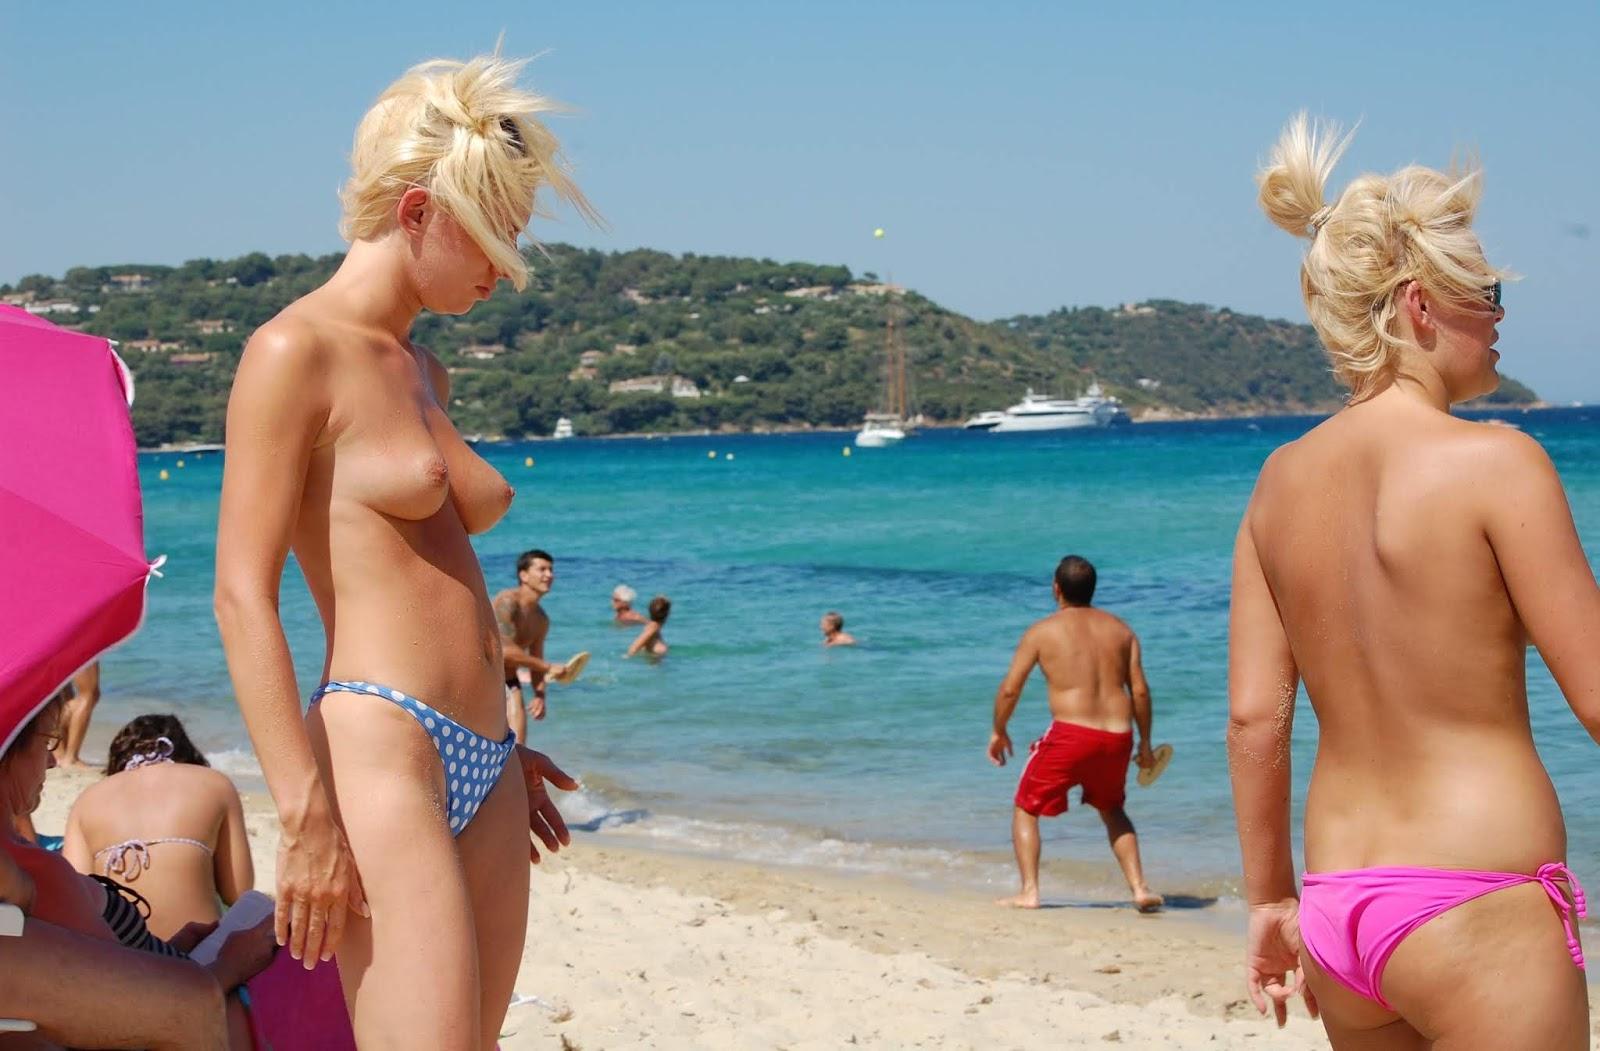 Boston alicia topless ex girlfriend beach, mature amateur women fuck video